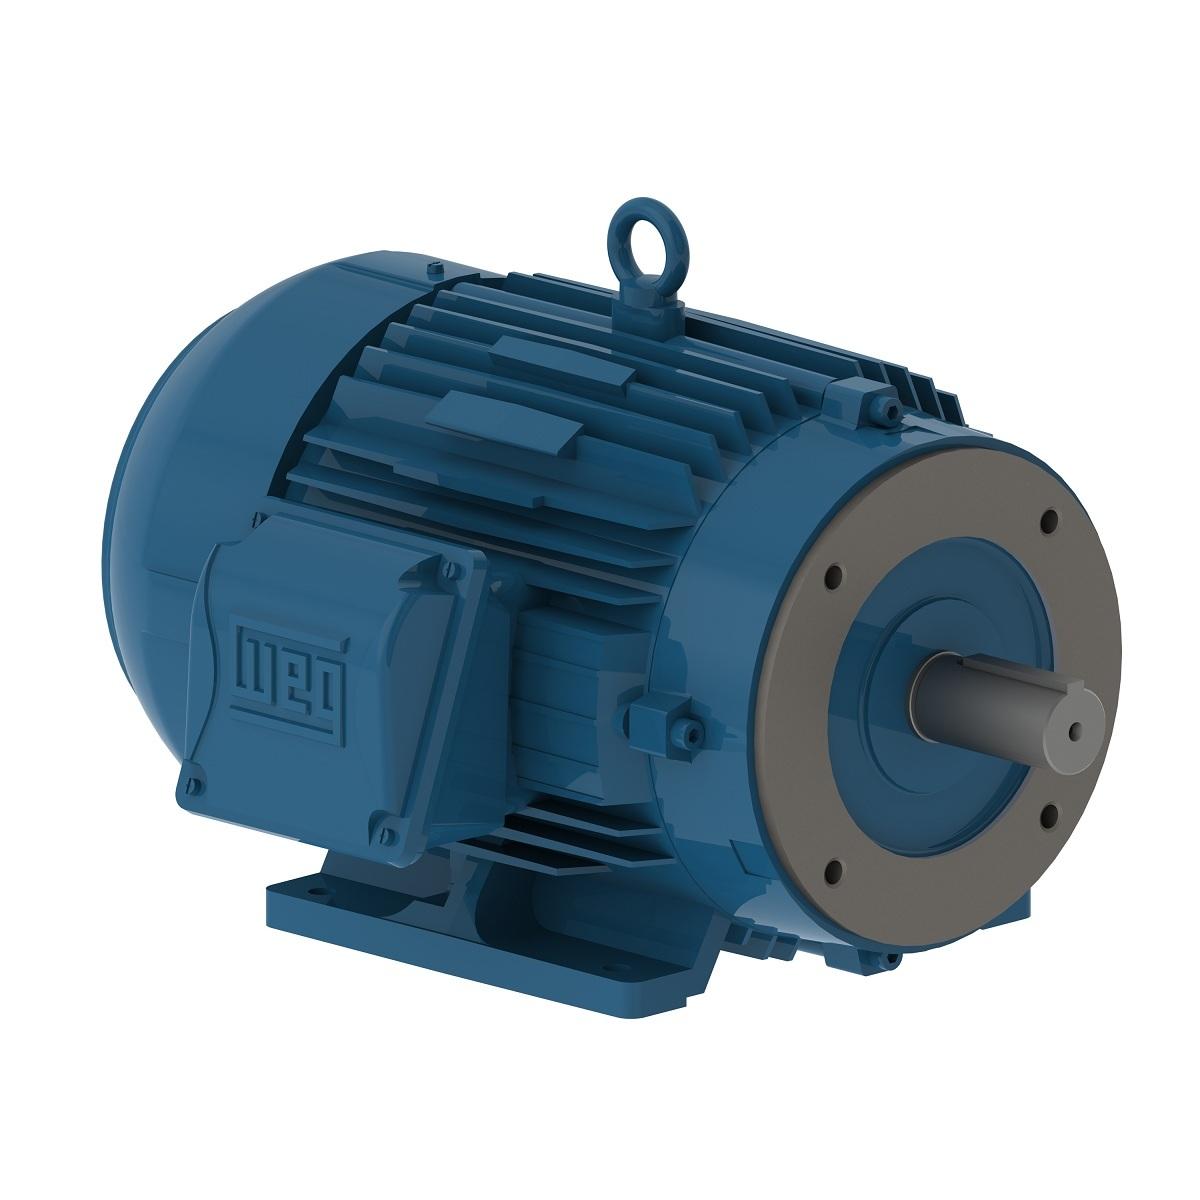 Motores Electricos Prosea Distribuidor Weg Siemens Yaskawa